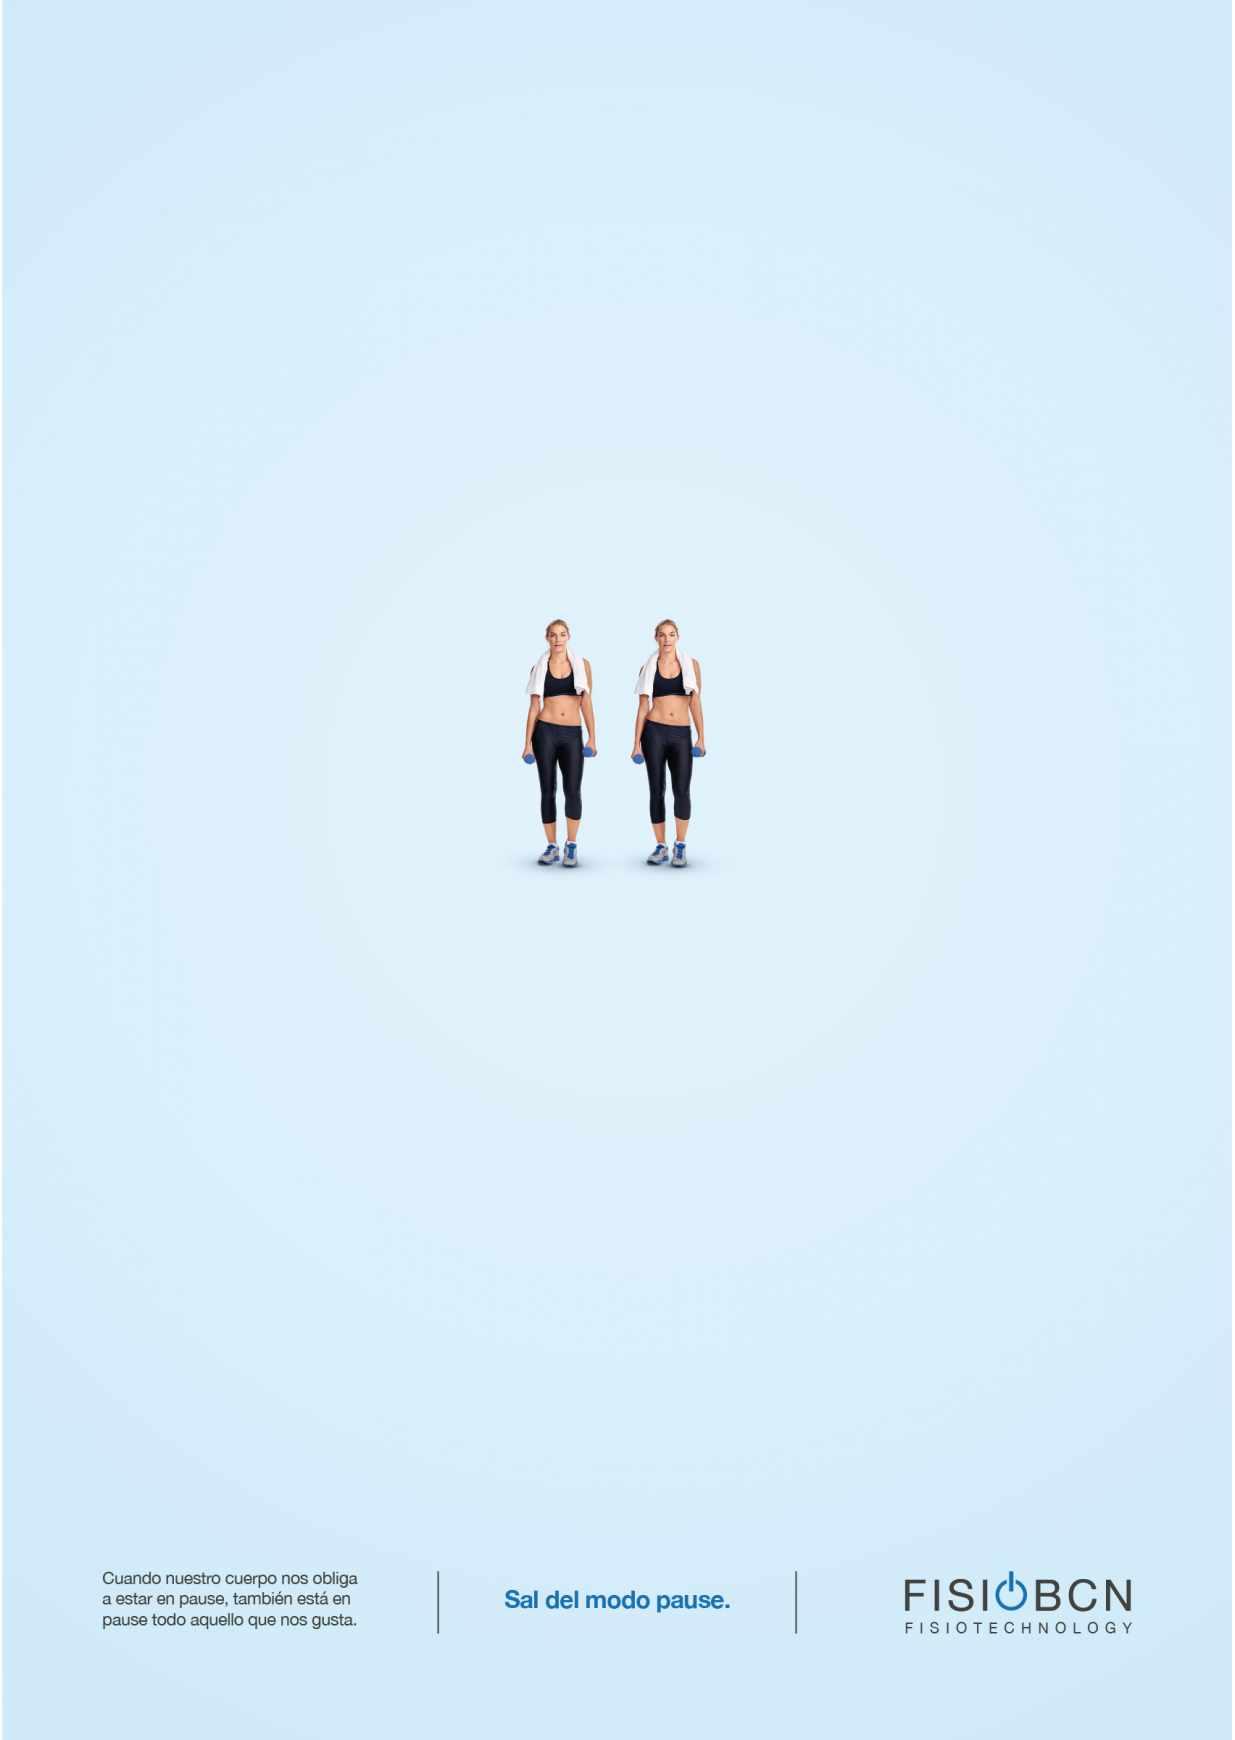 Fisio BCN Print Ad - Pause - Gym